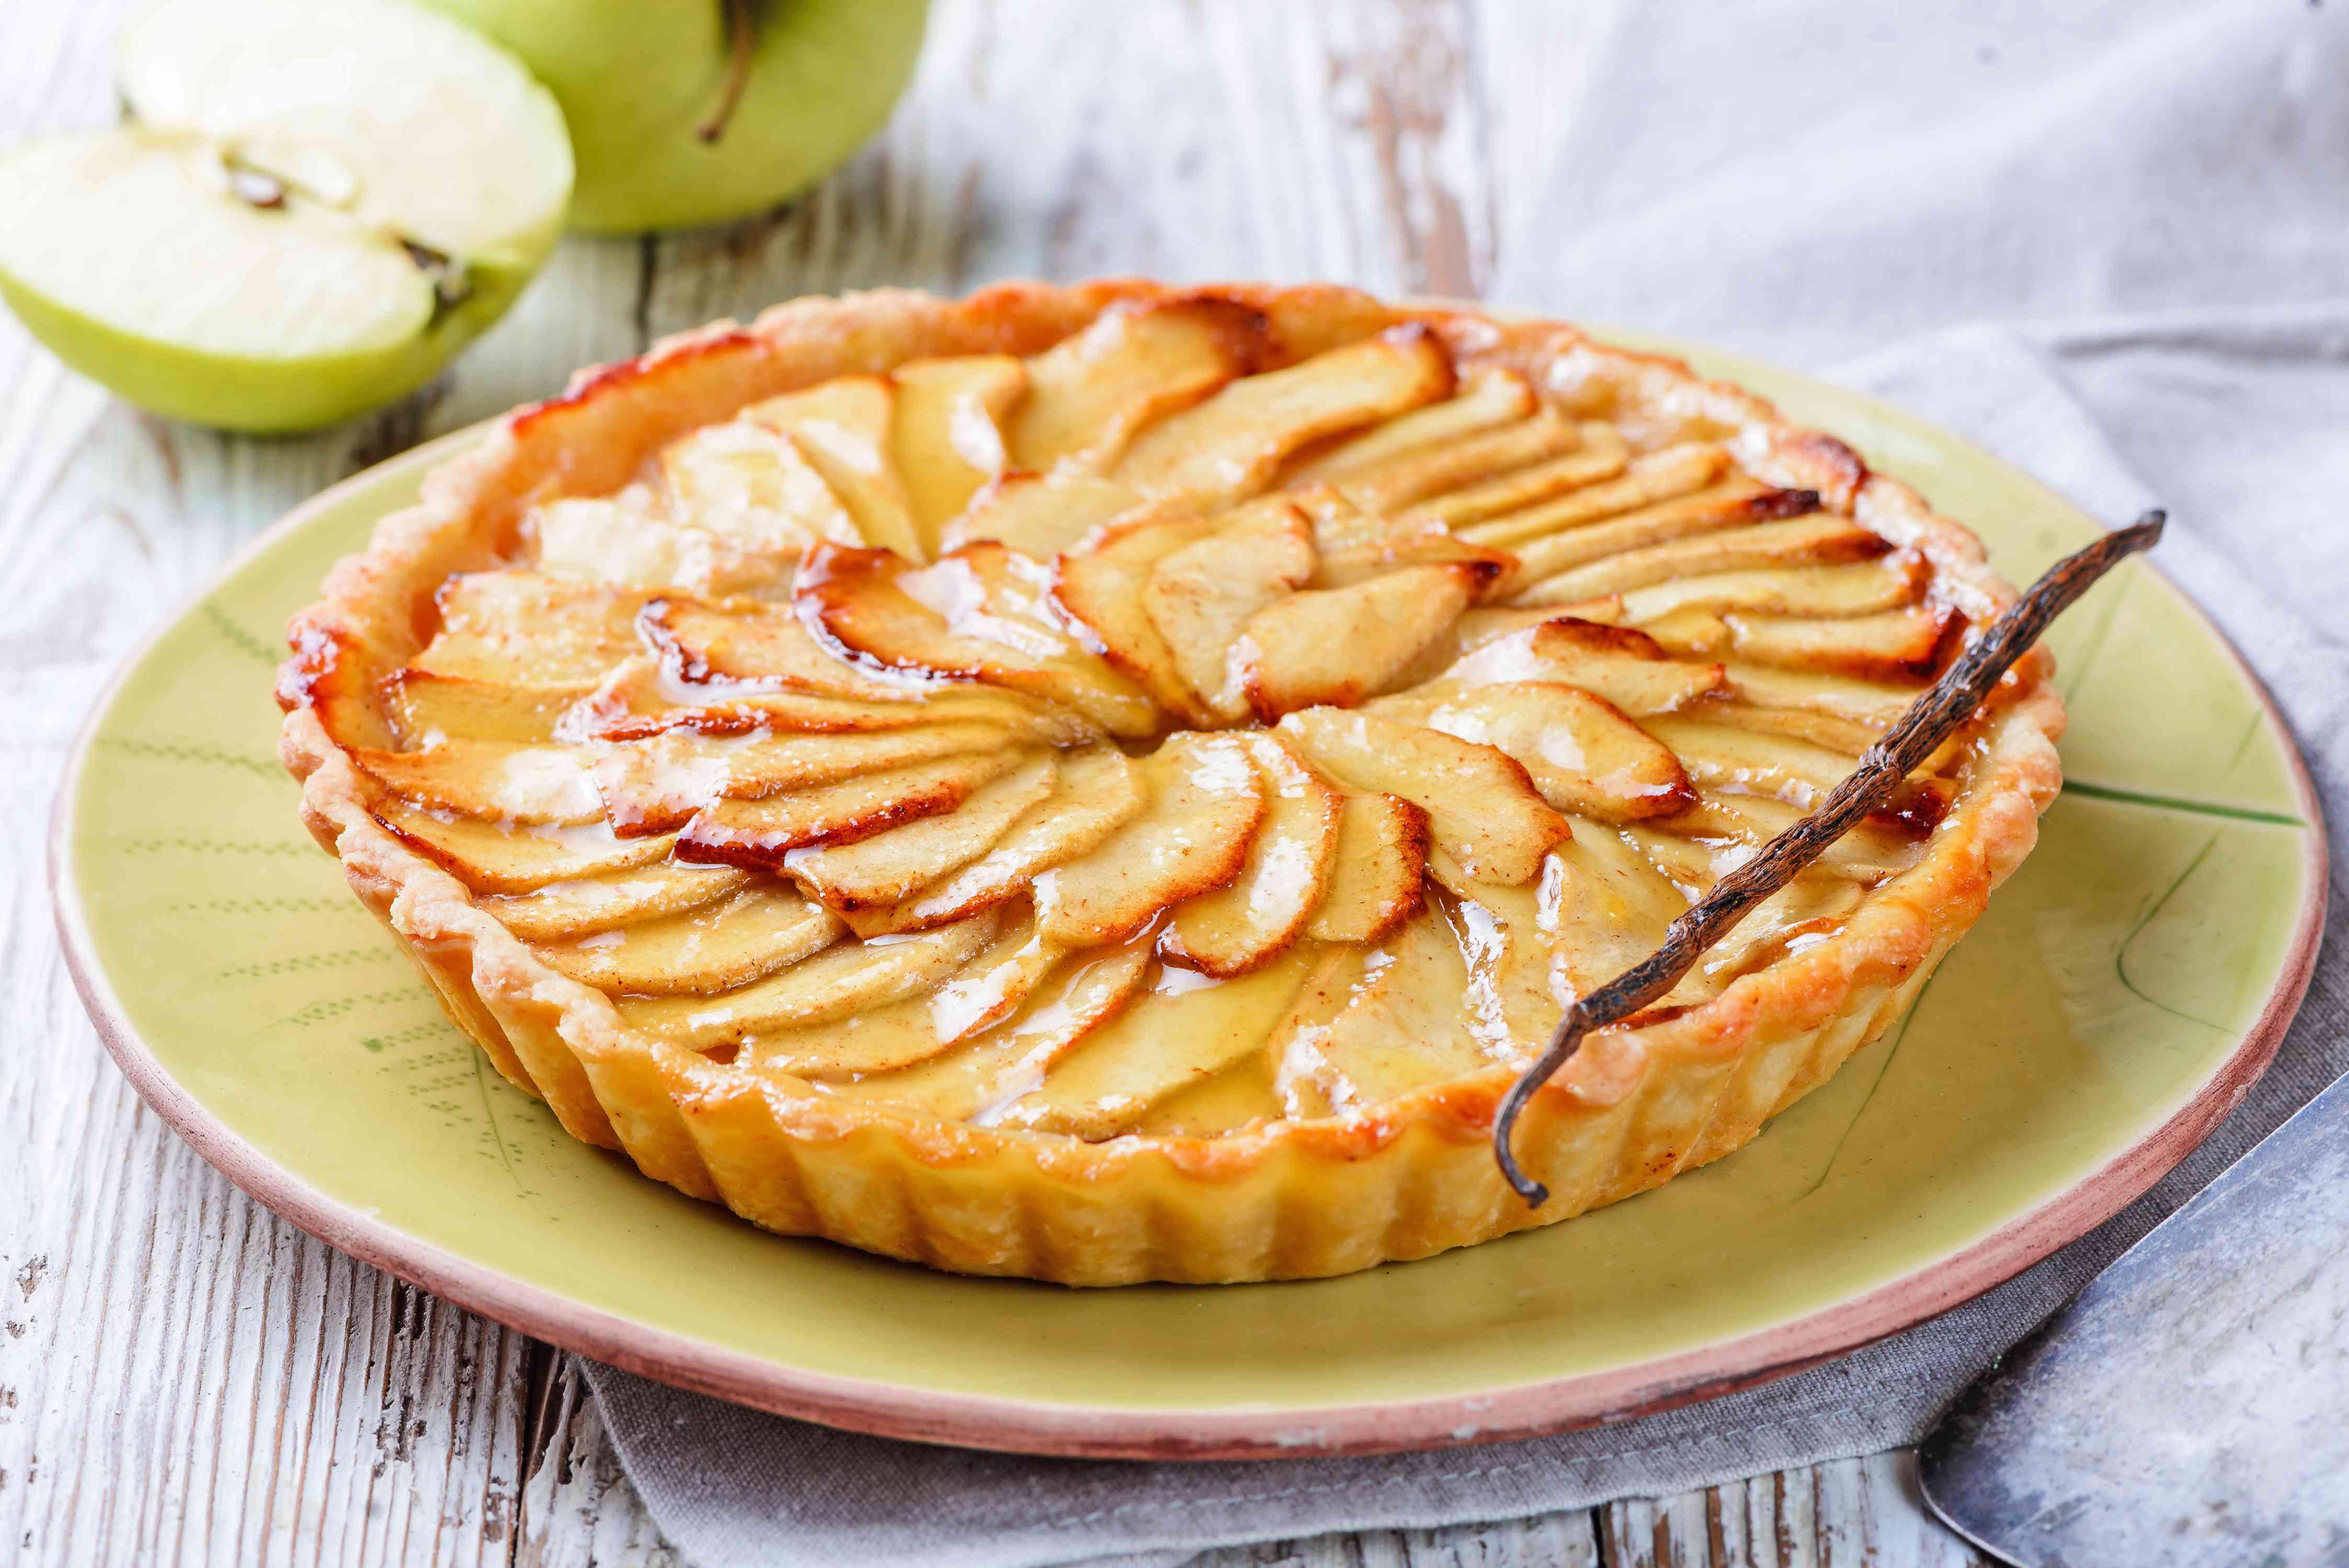 Refridgerate tart